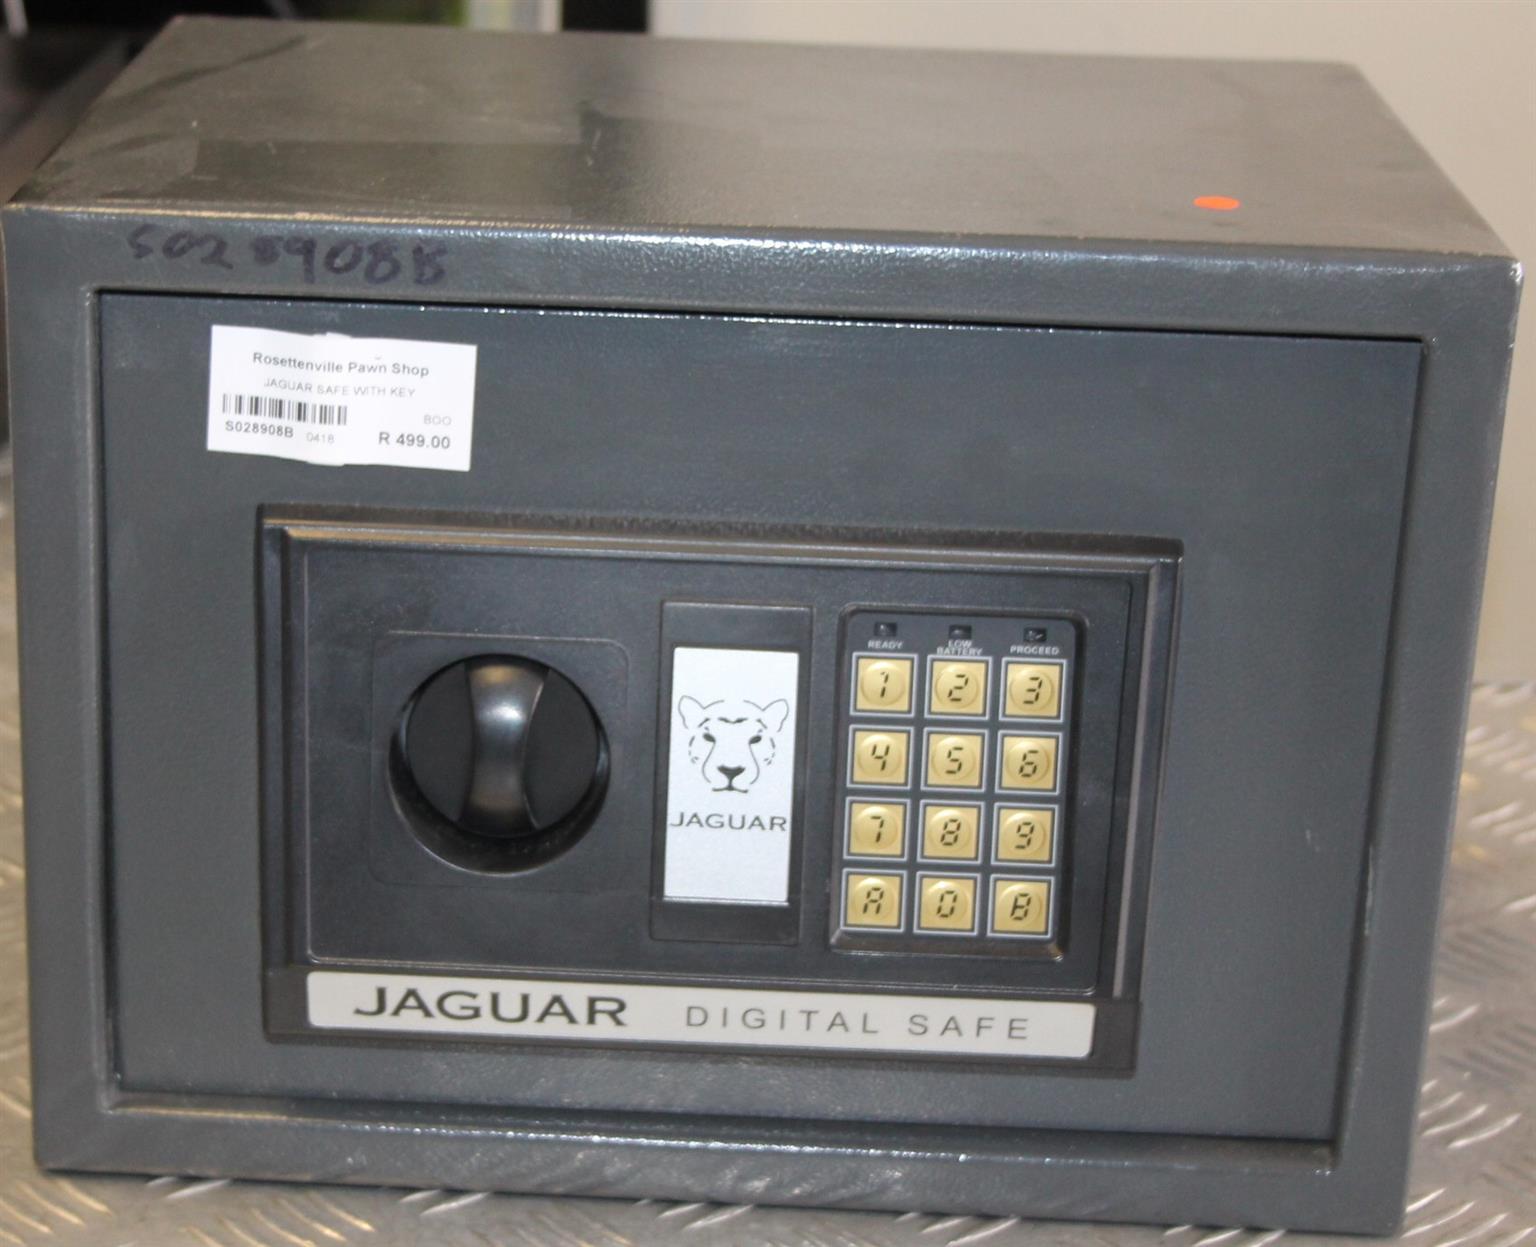 Jaguar safe S028908b #Rosettenvillepawnshop